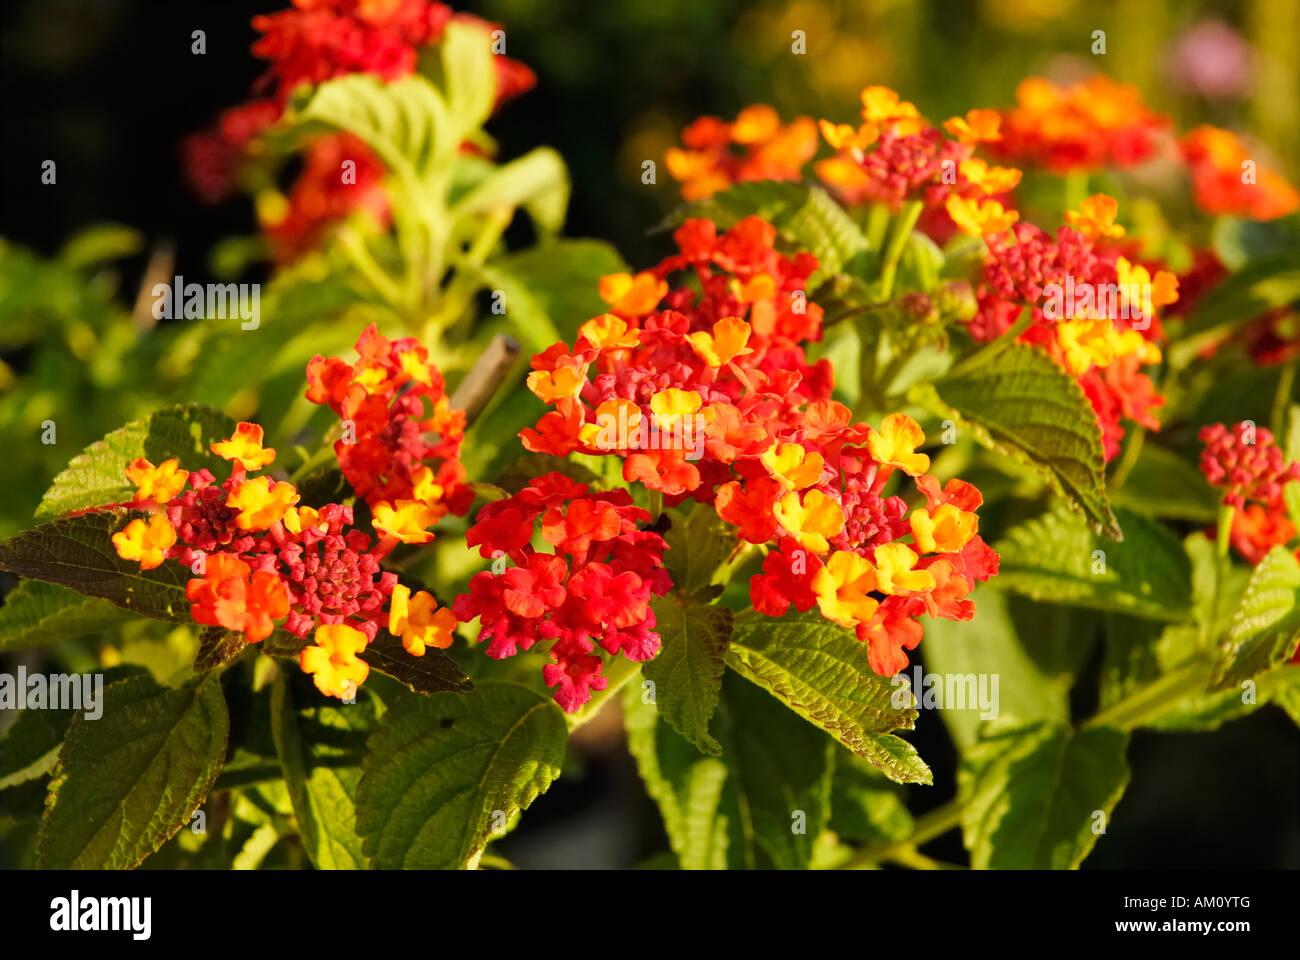 tropical lantana plant with splenid flowers lantna amata. Black Bedroom Furniture Sets. Home Design Ideas